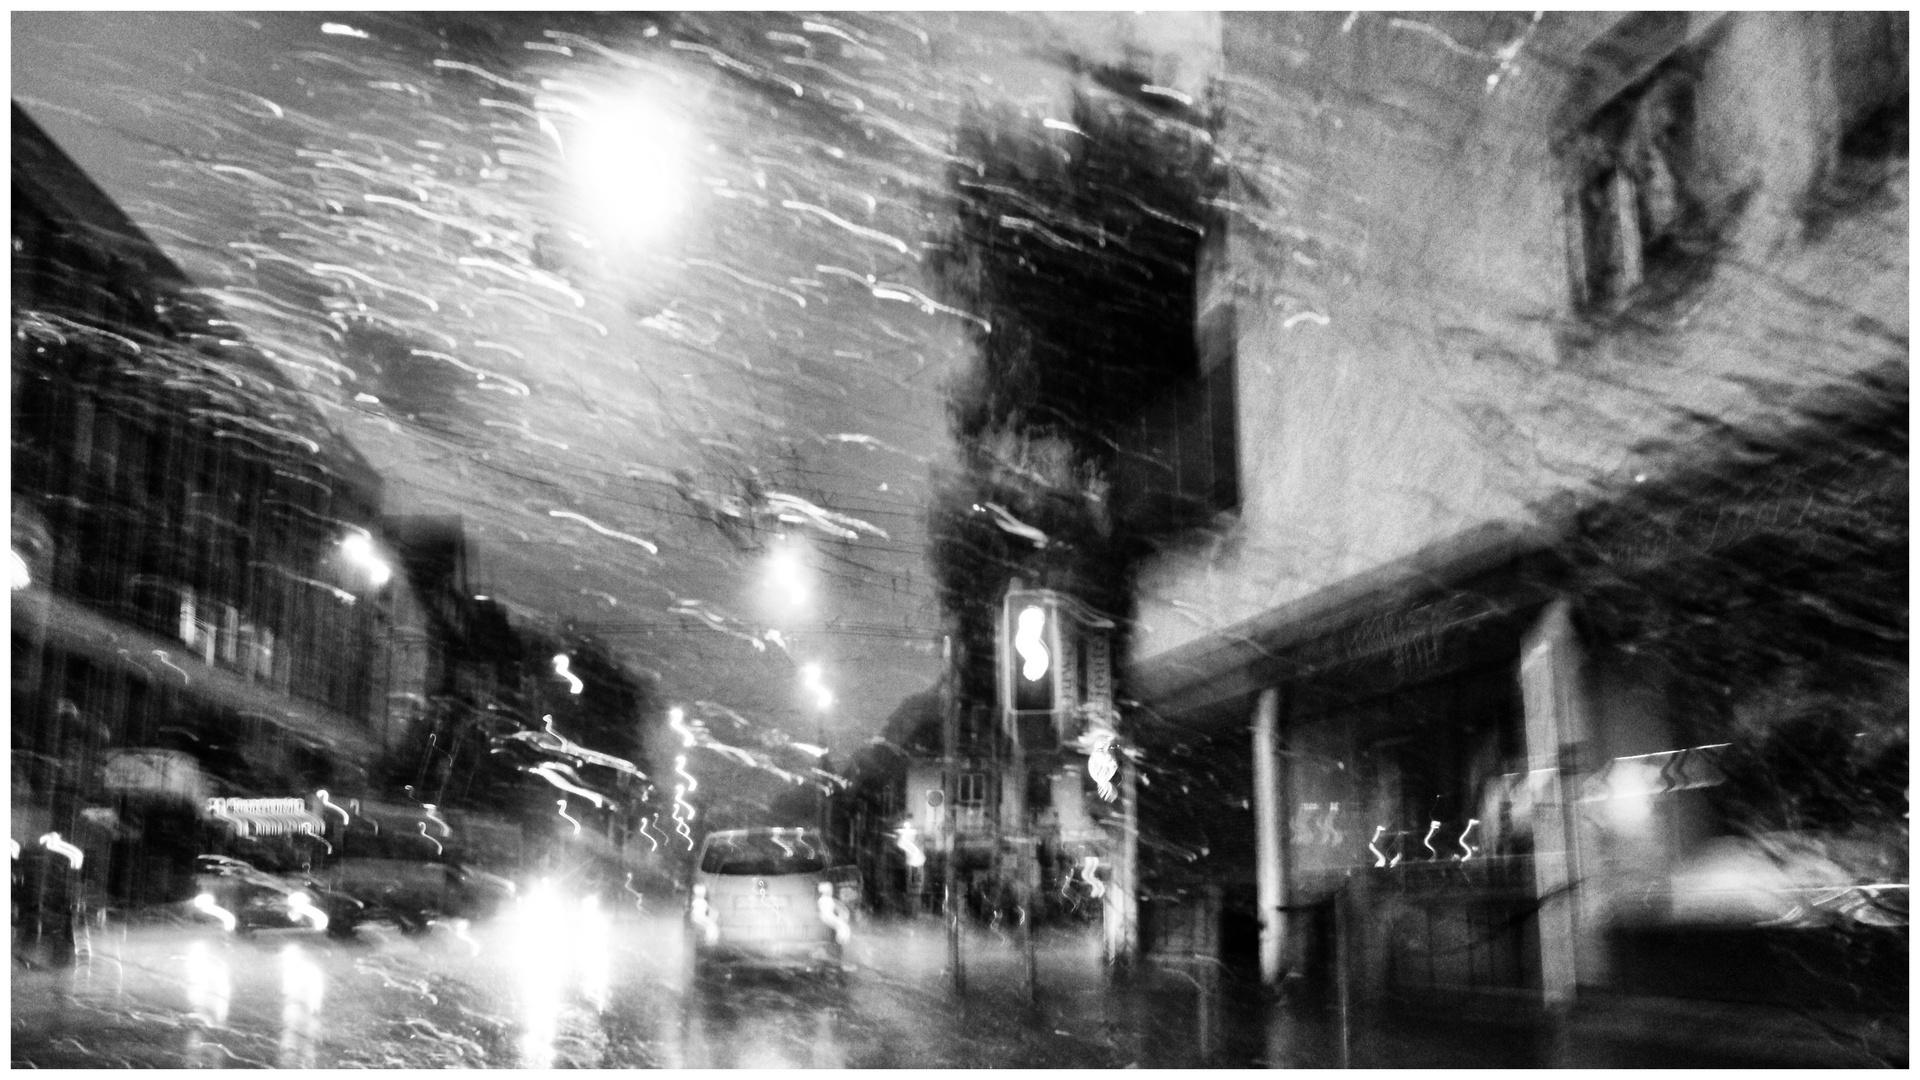 Regen in der Stadt